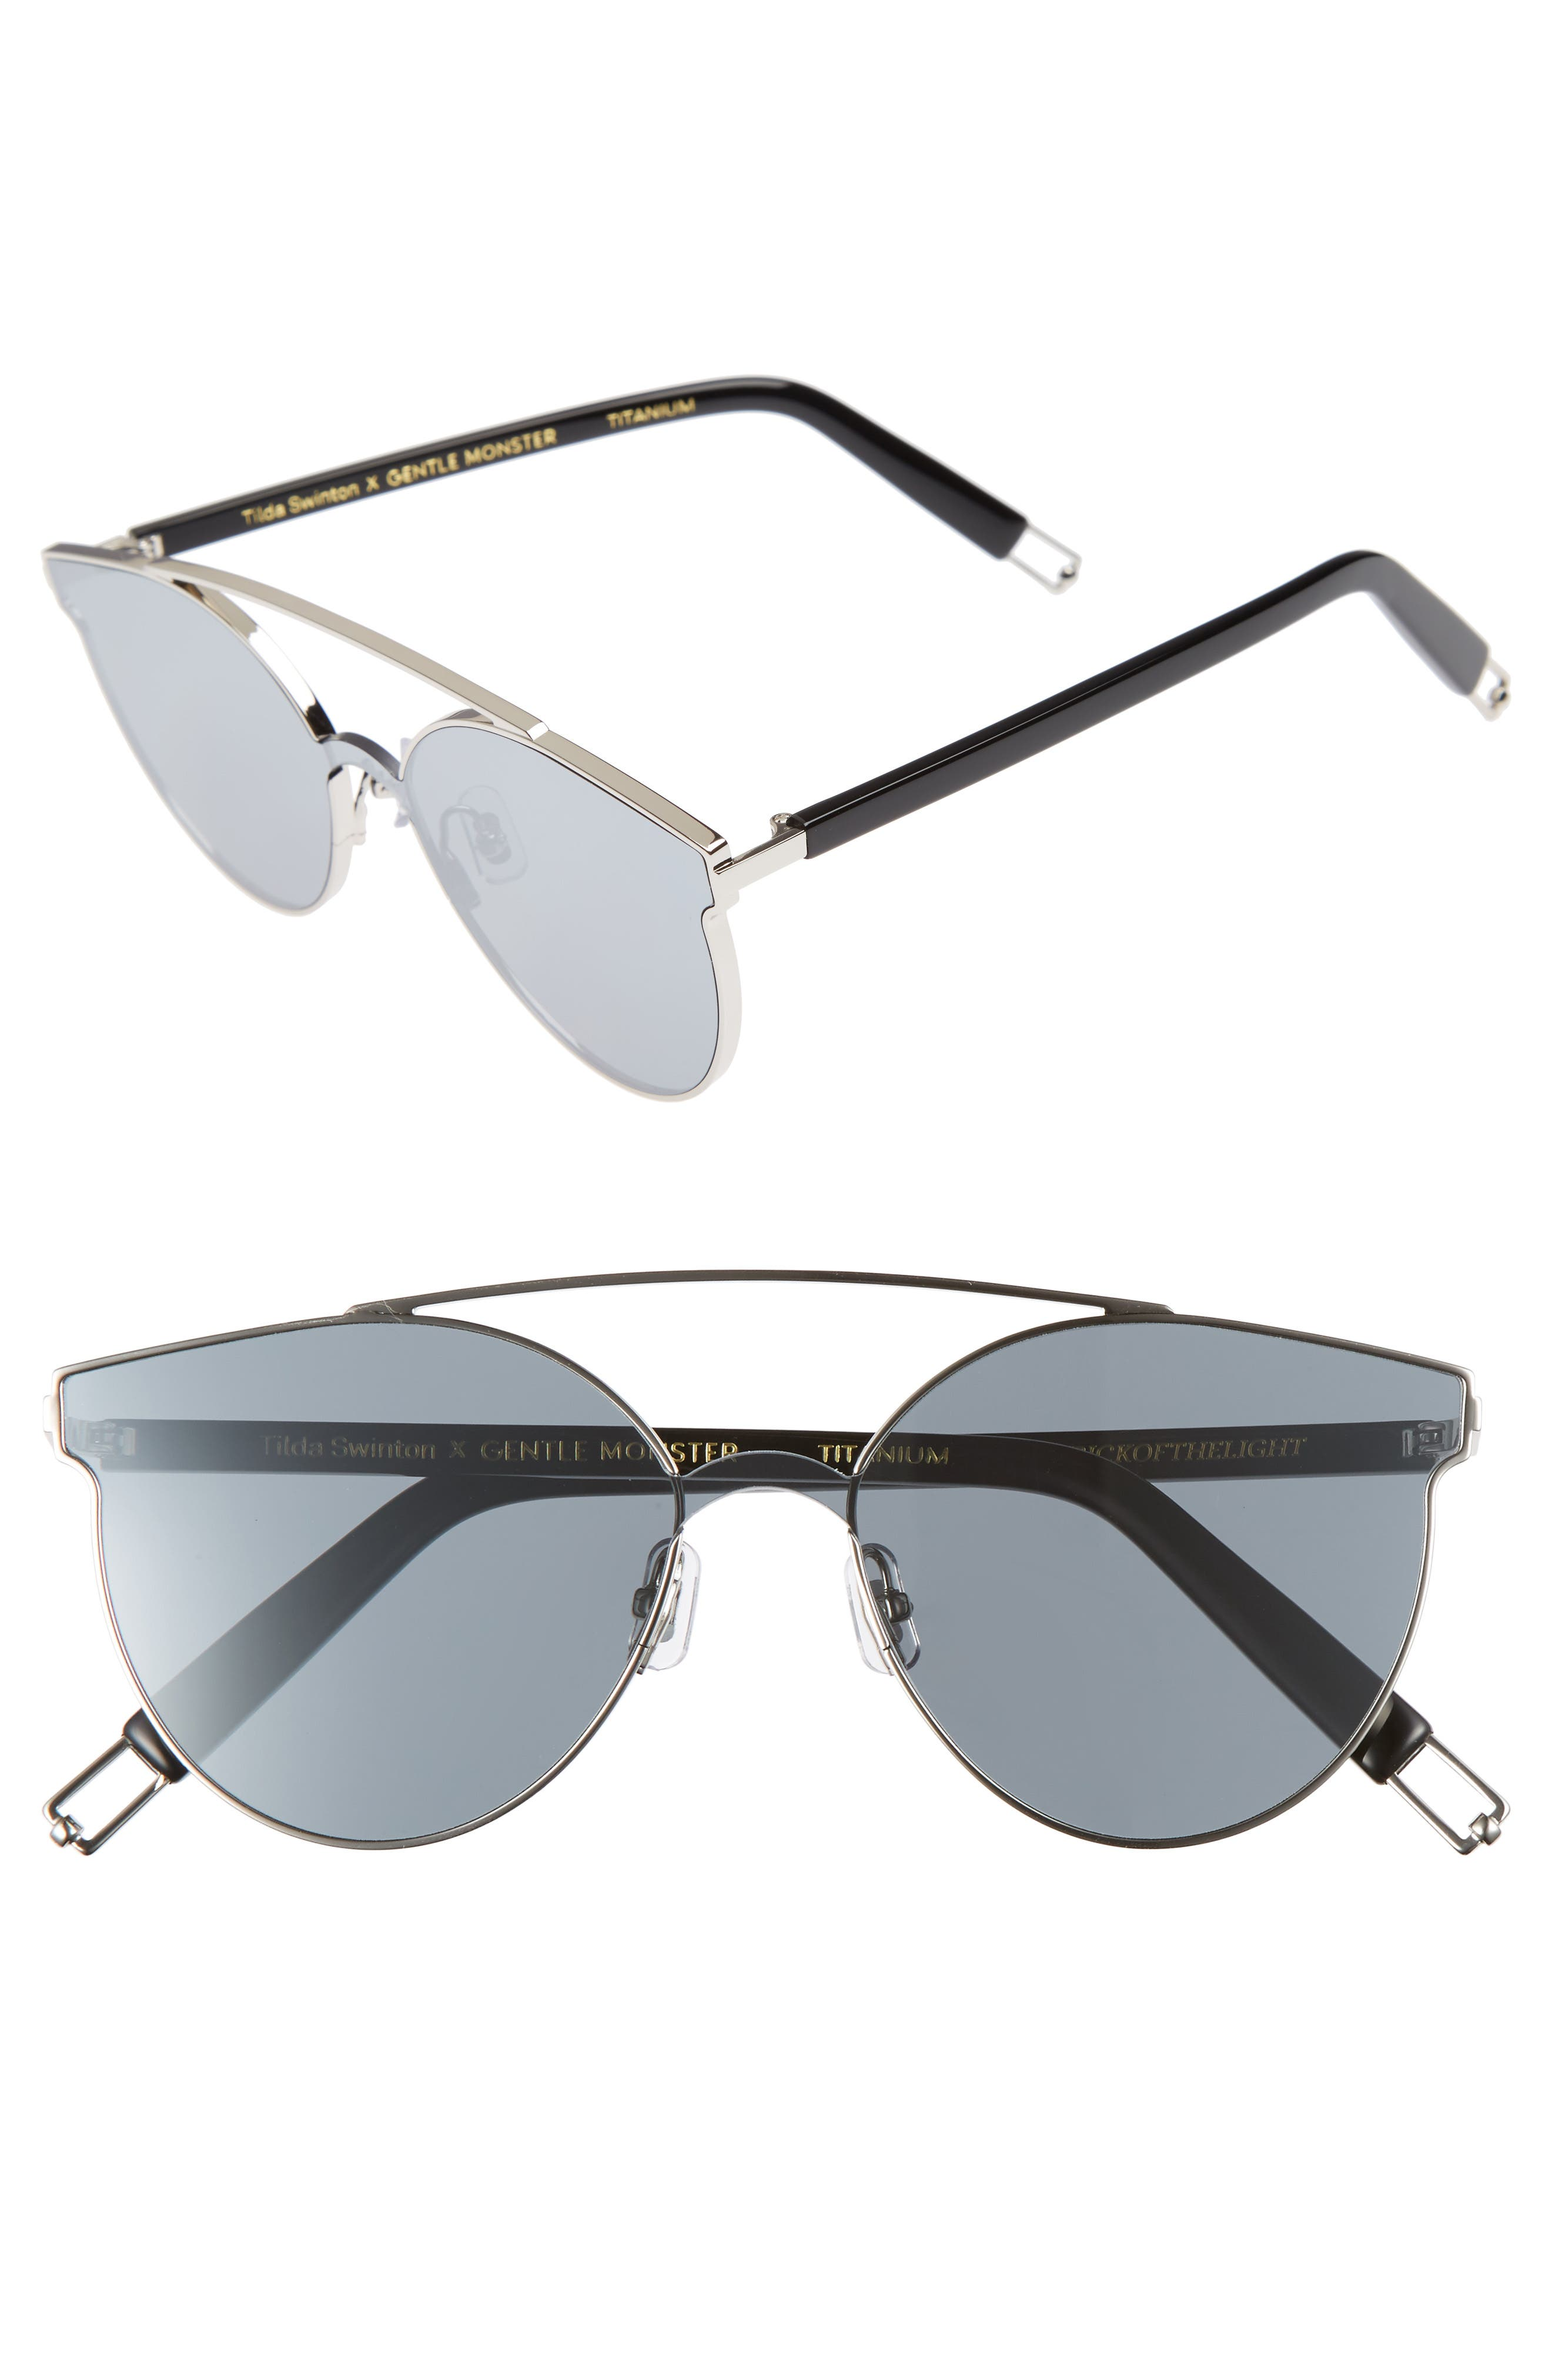 Tilda Swinton x Gentle Monster Trick of the Light 60mm Shield Sunglasses